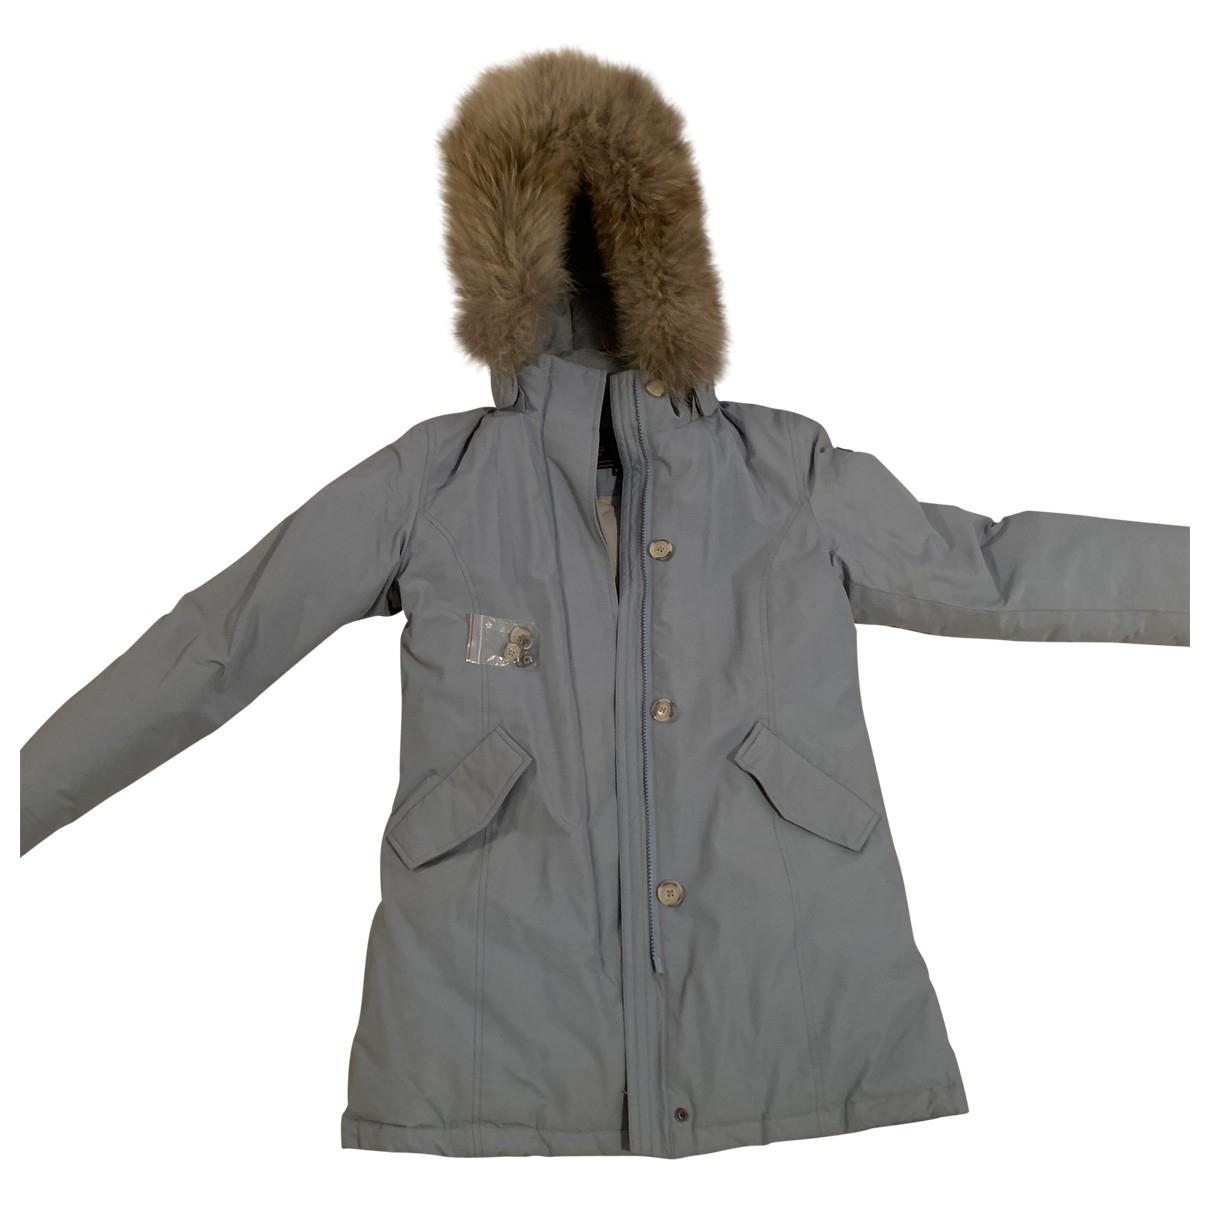 Woolrich \N Blue Fur jacket & coat for Kids 14 years - S FR